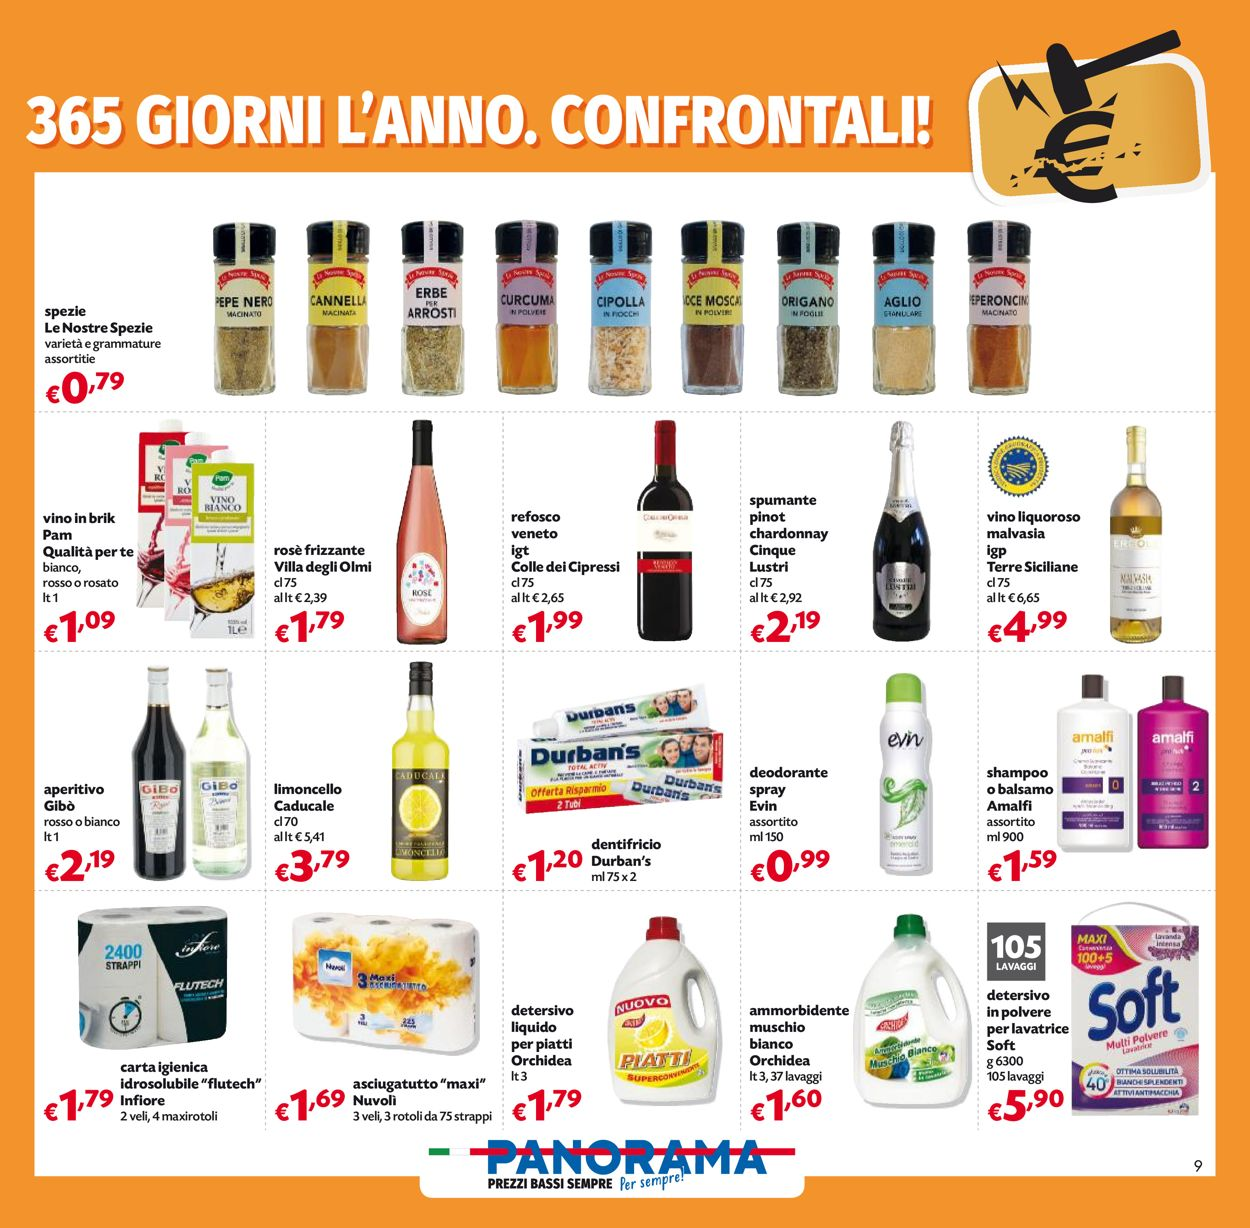 Volantino Pam Panorama - Offerte 06/04-21/04/2021 (Pagina 9)